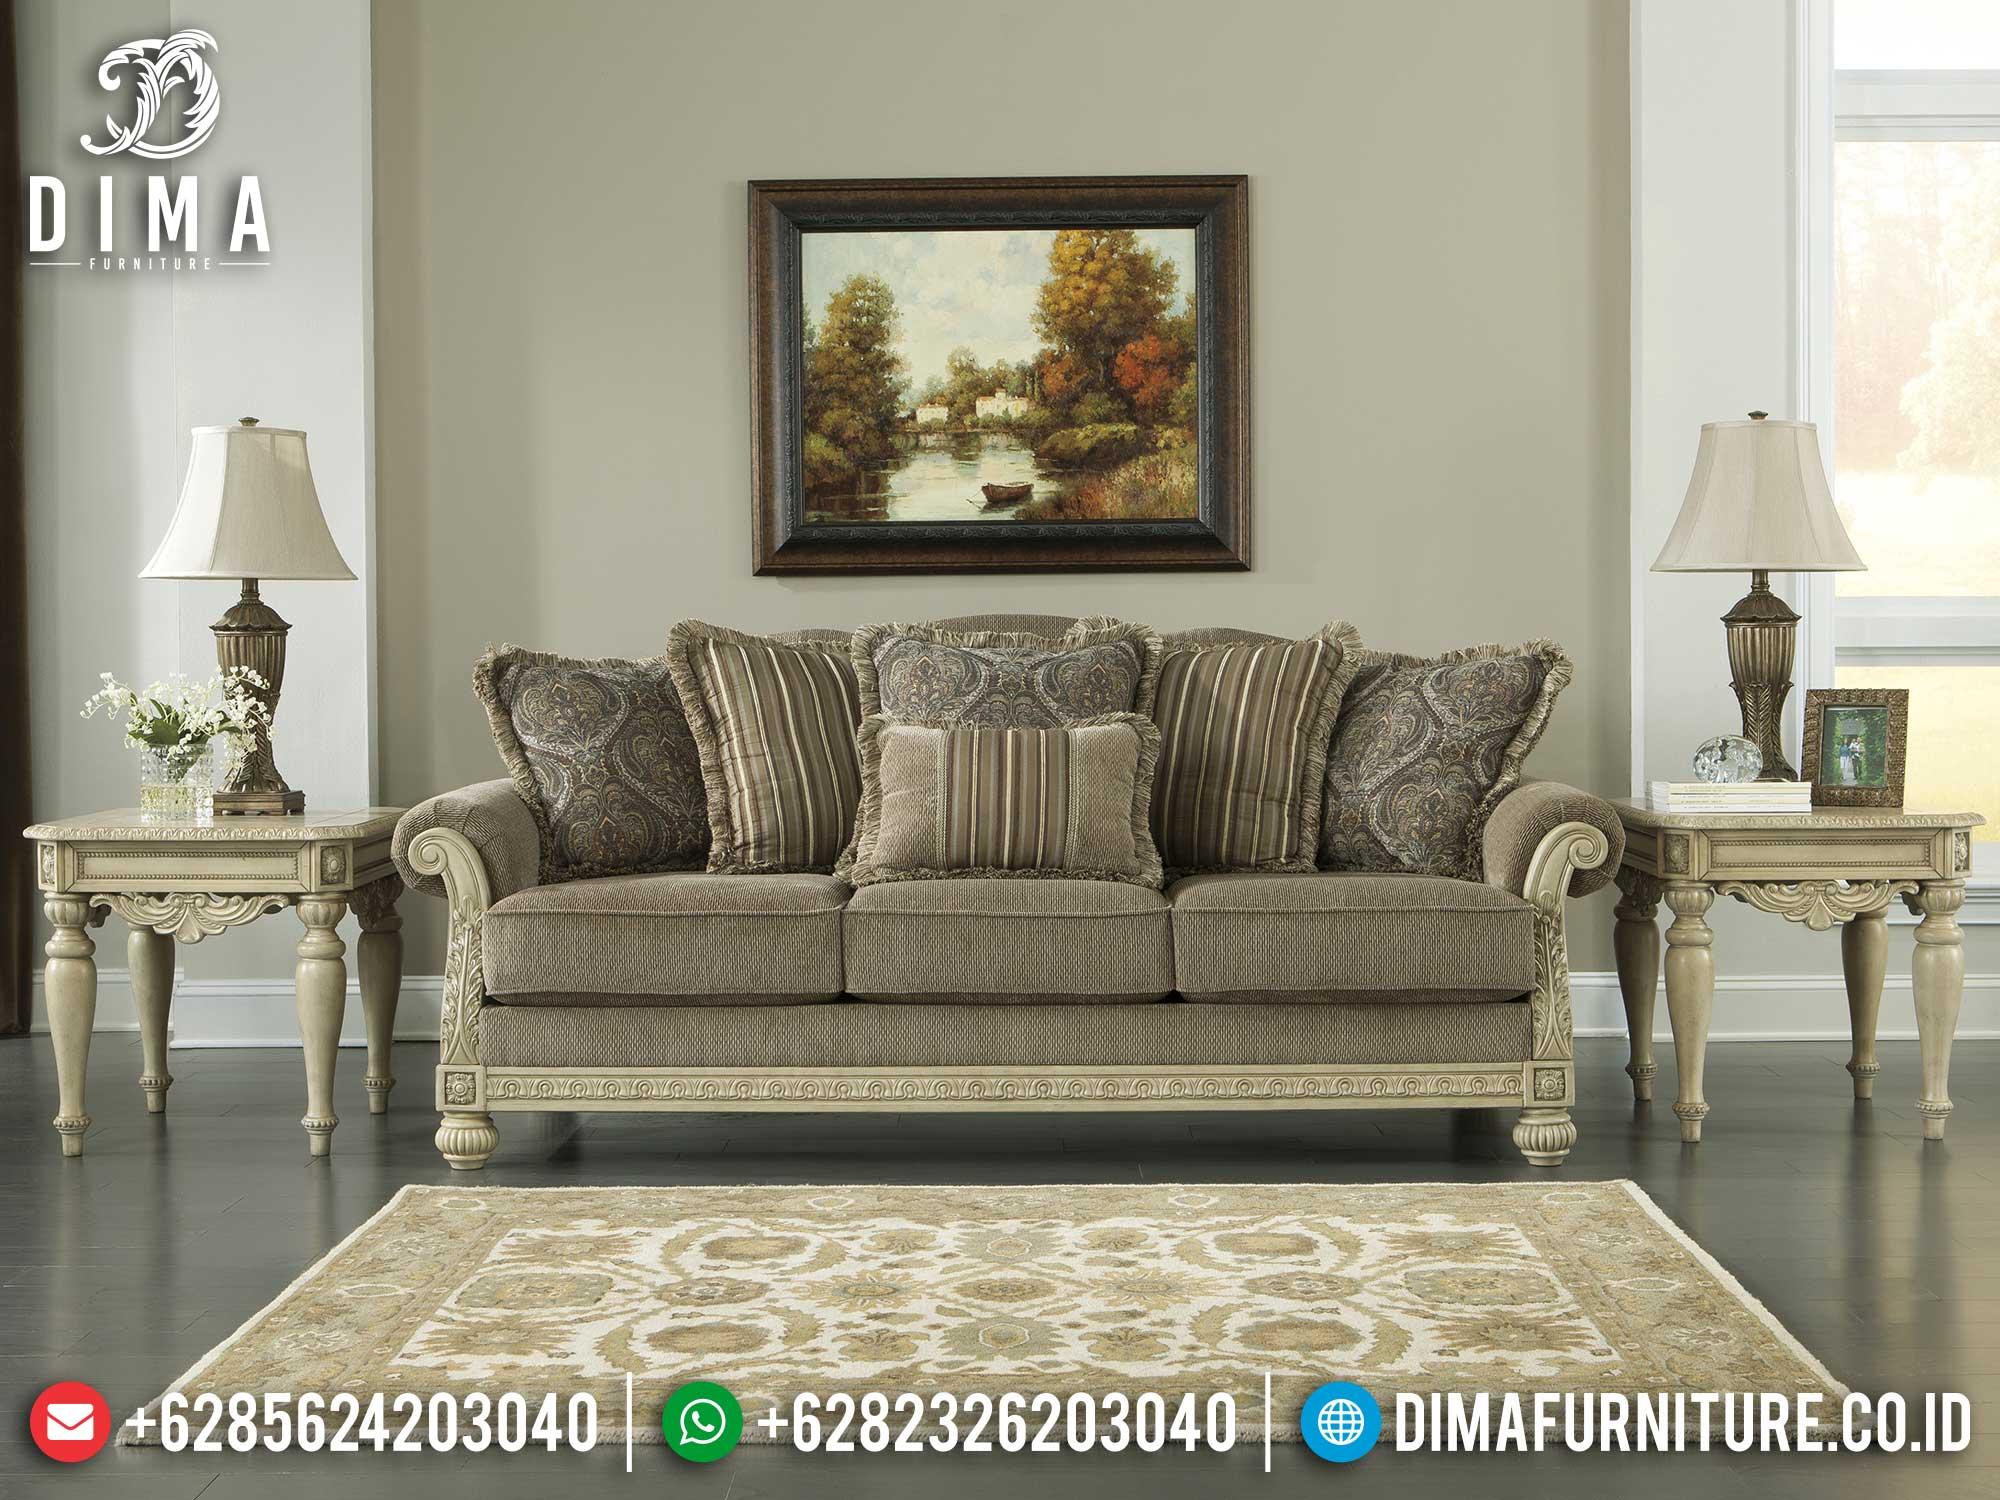 Sofa 3 Dudukan Mewah Classic Luxurious Premiere Design Furniture Jepara Mm-0937